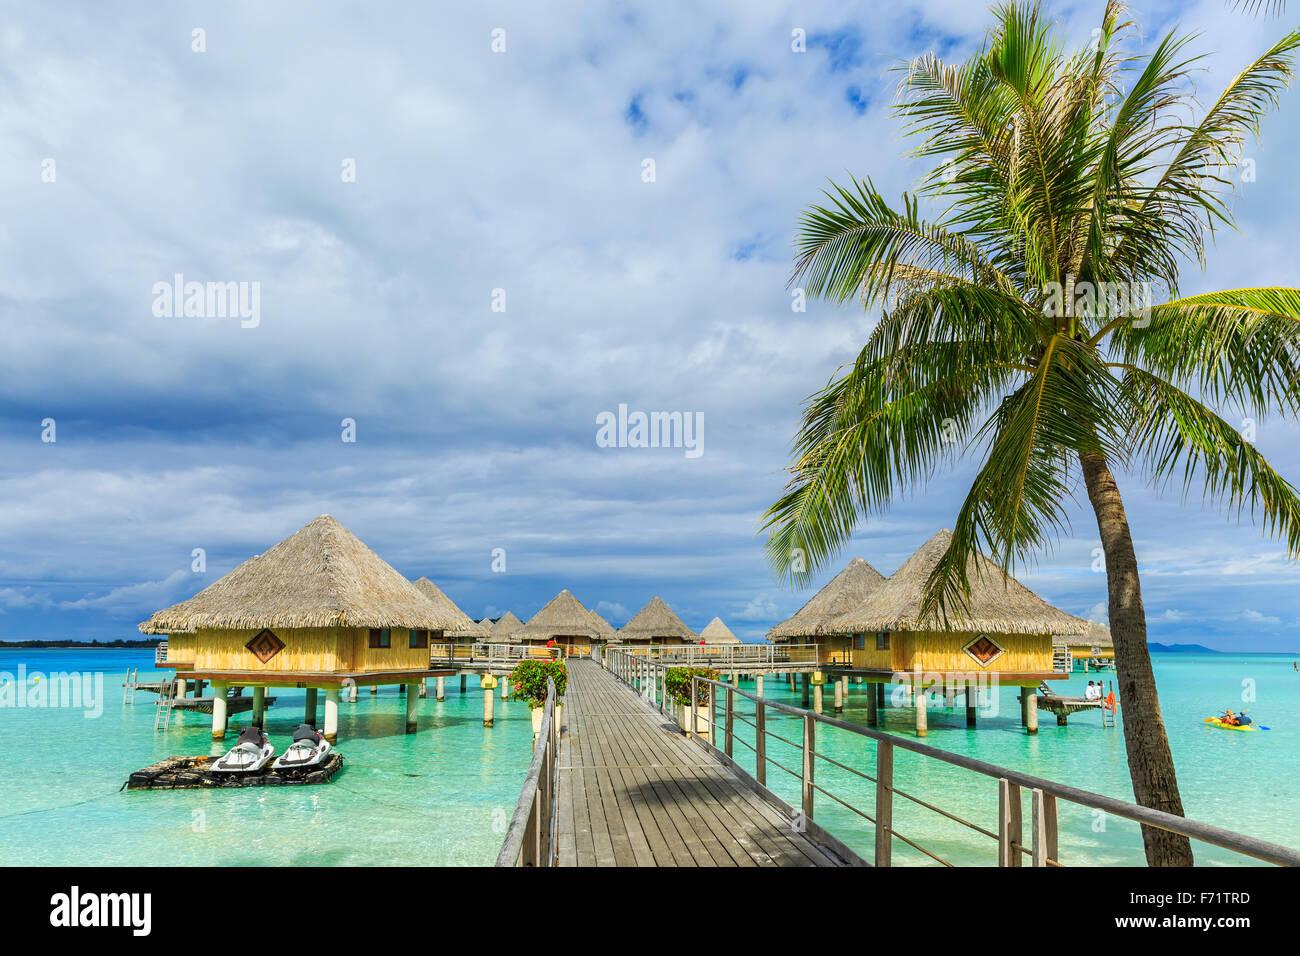 Bungalow Overwater isola di Bora Bora, Polinesia Francese Immagini Stock